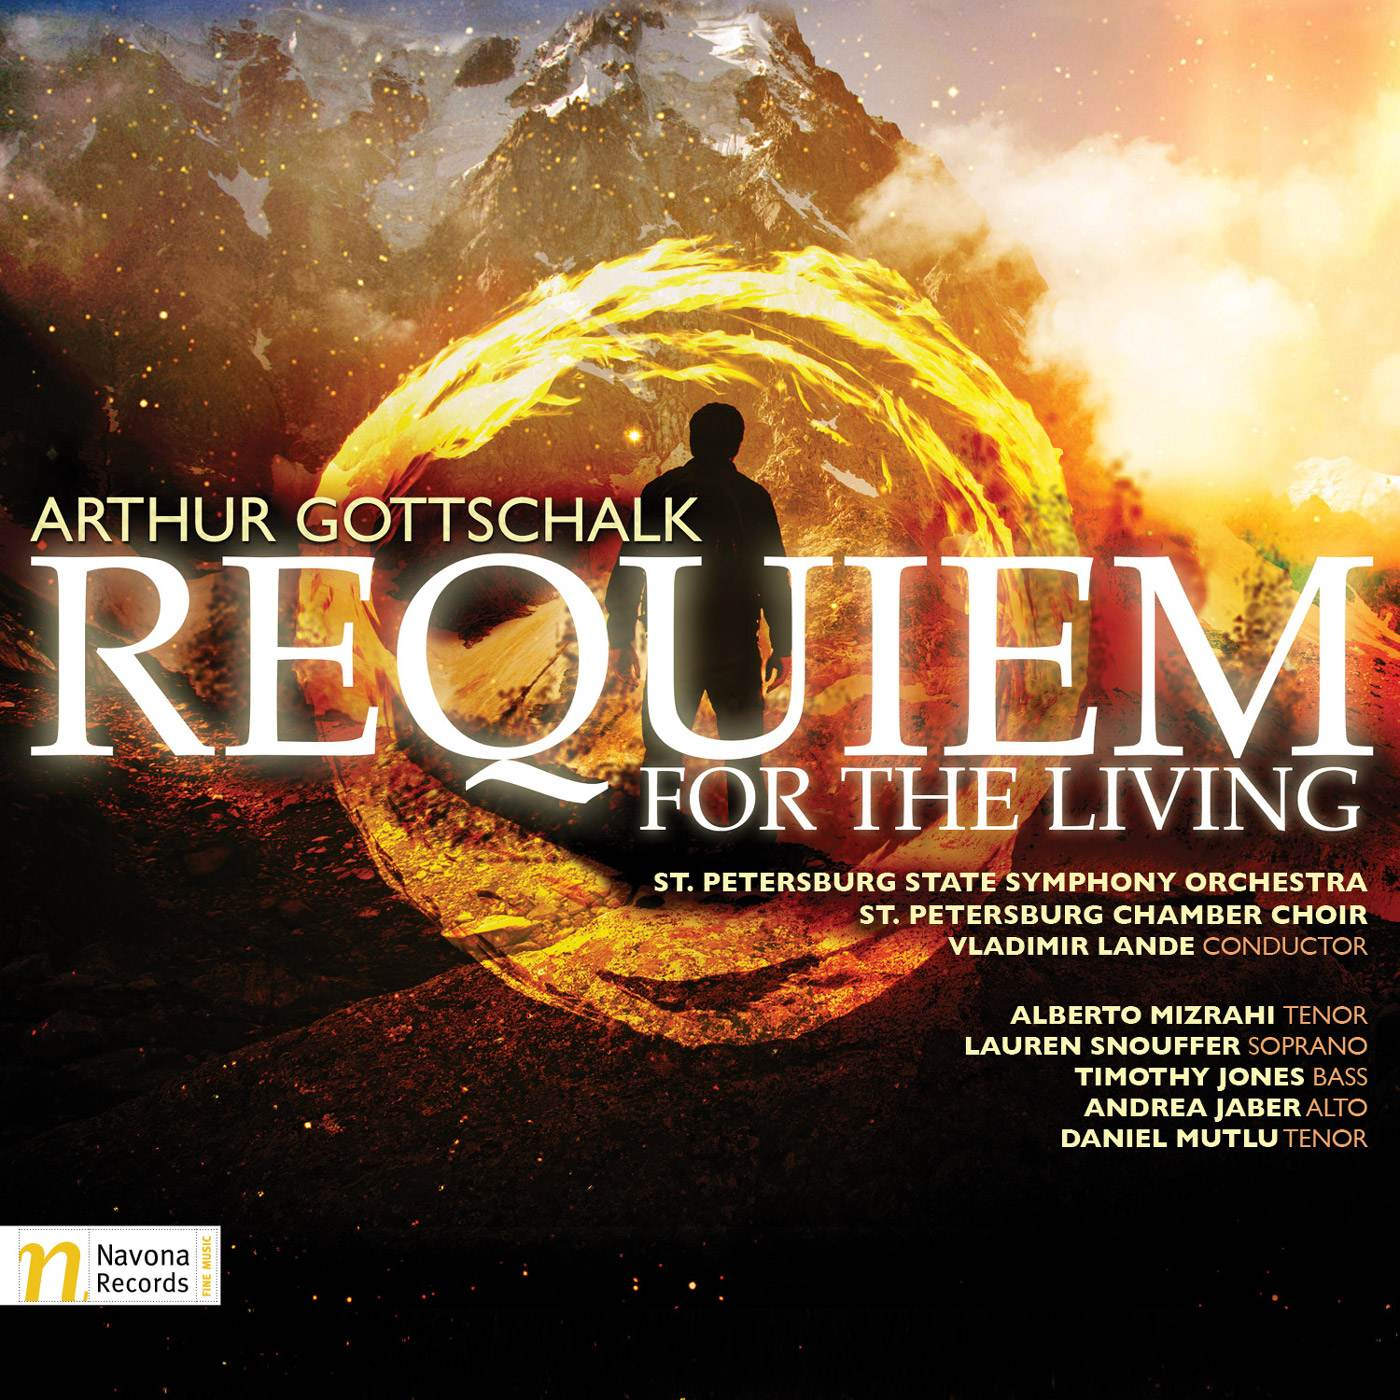 Requiem for the living album